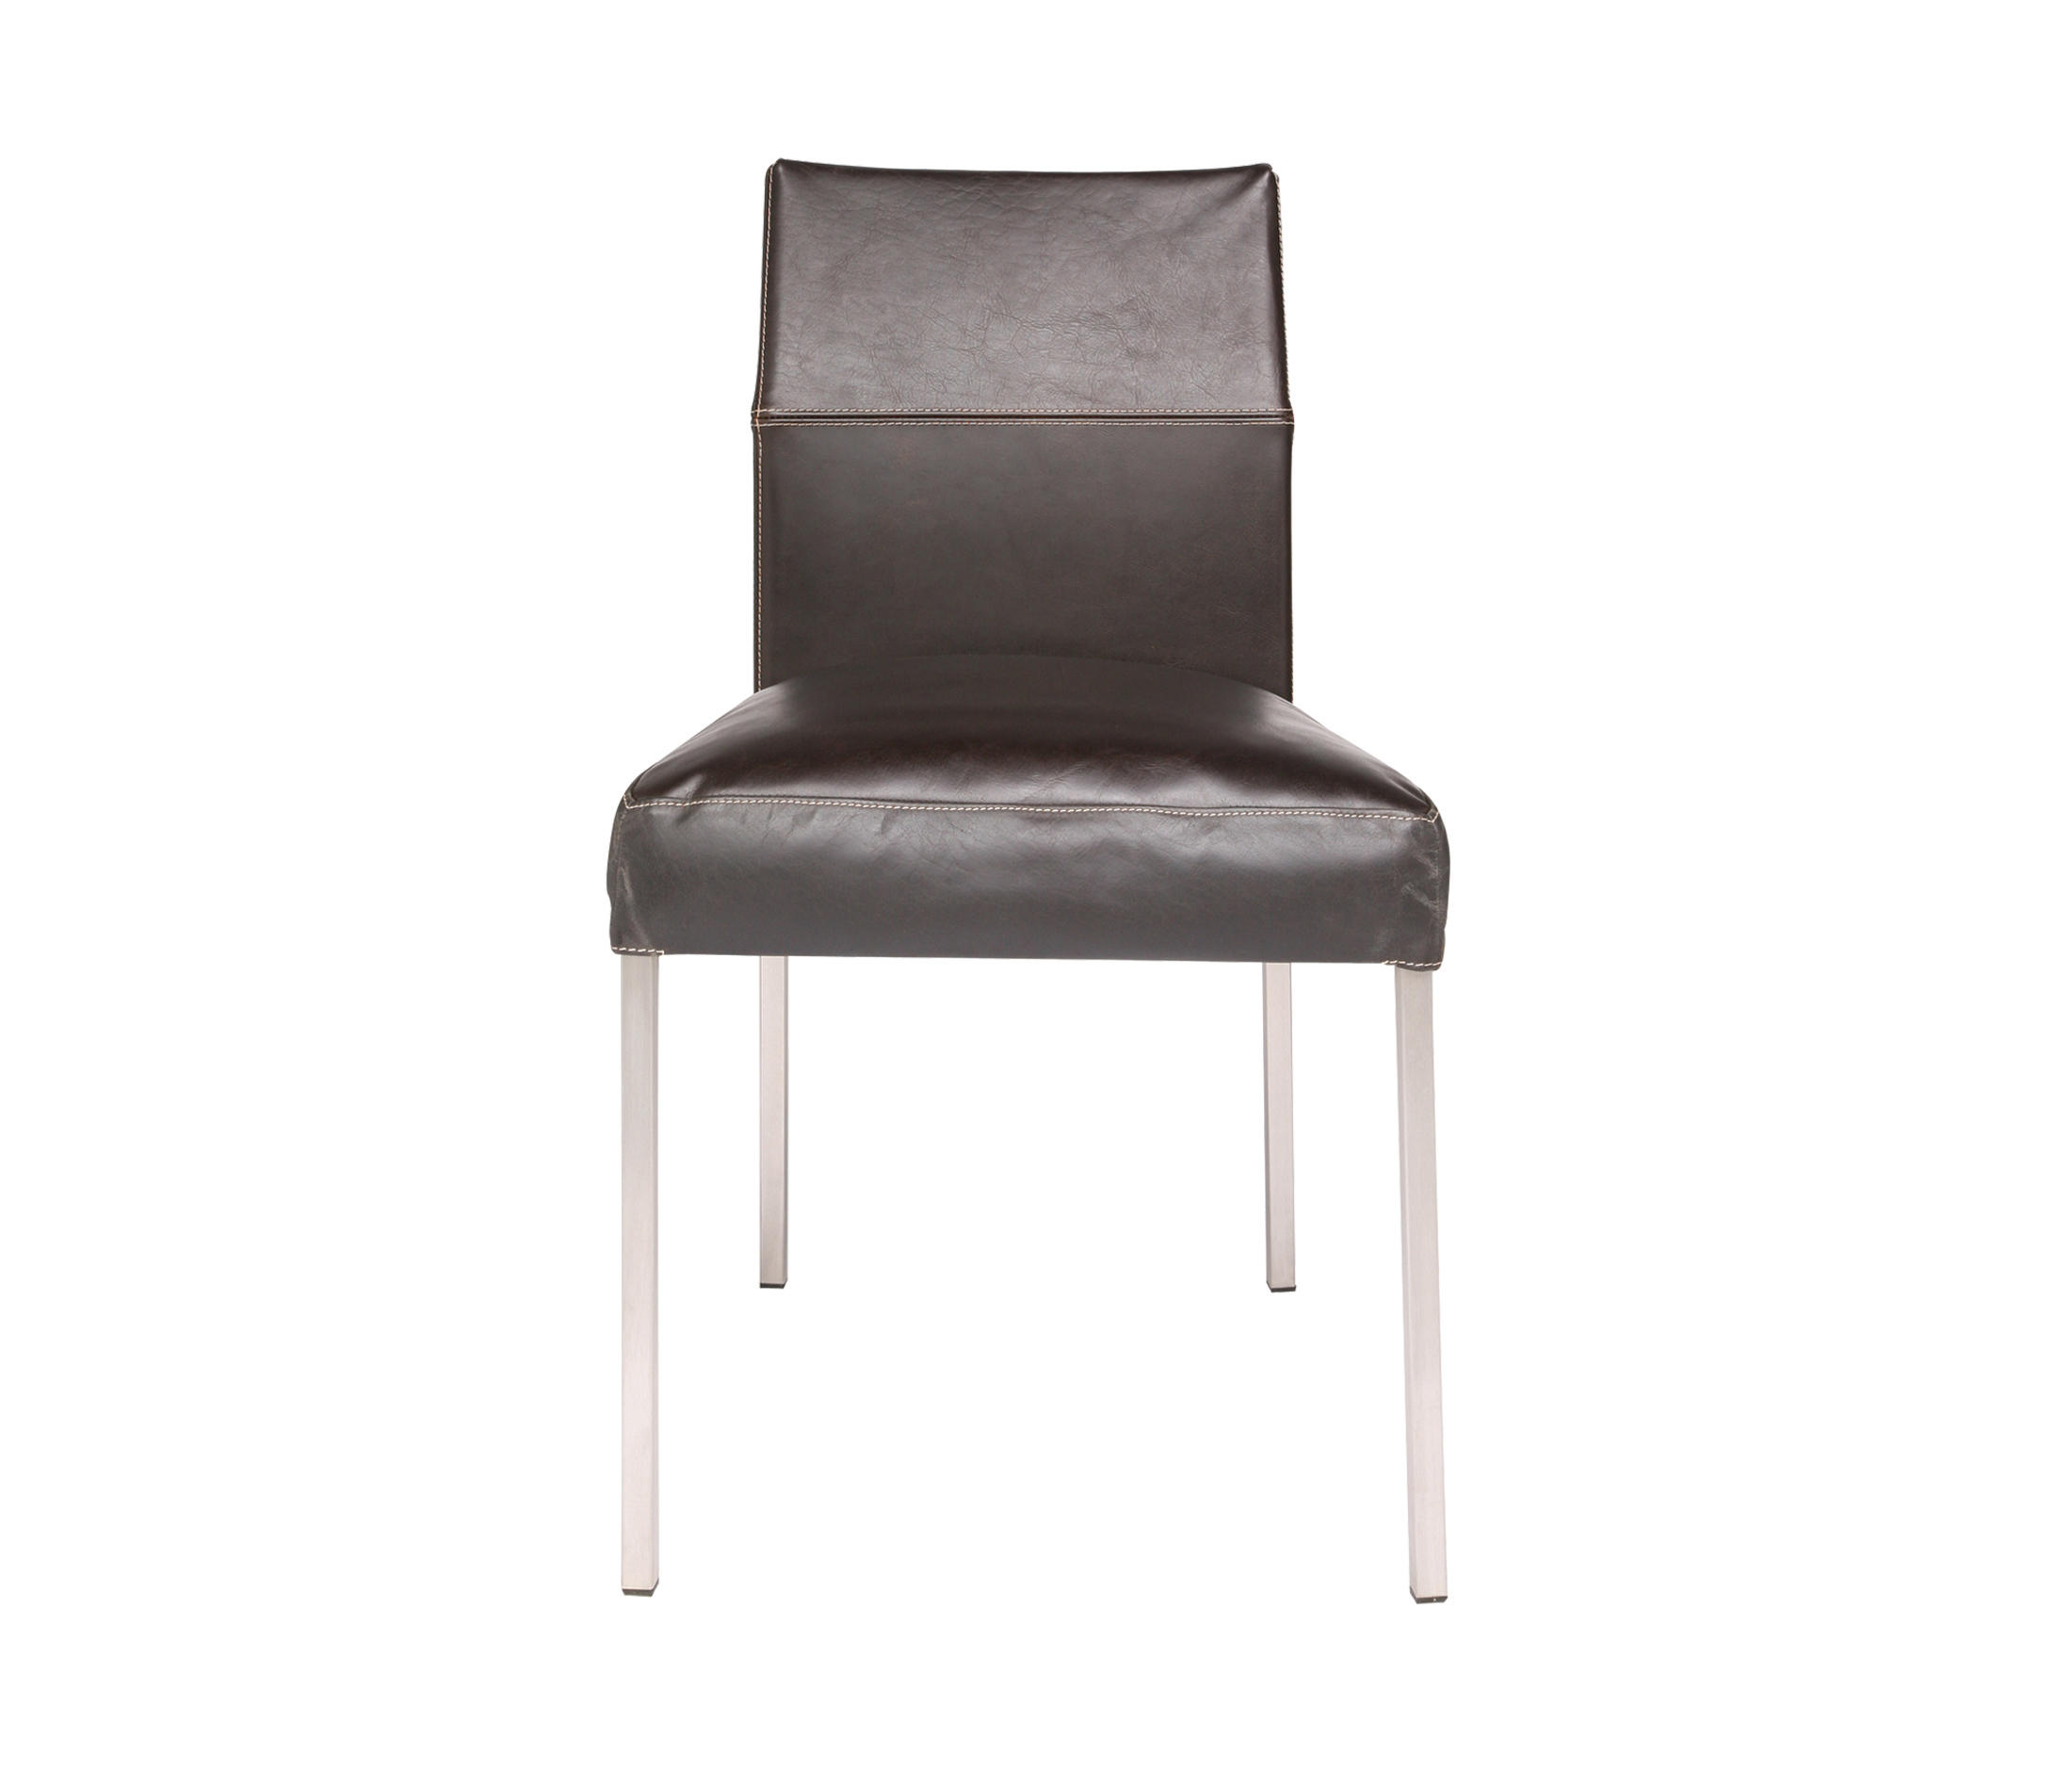 texas stuhl besucherst hle von kff architonic. Black Bedroom Furniture Sets. Home Design Ideas